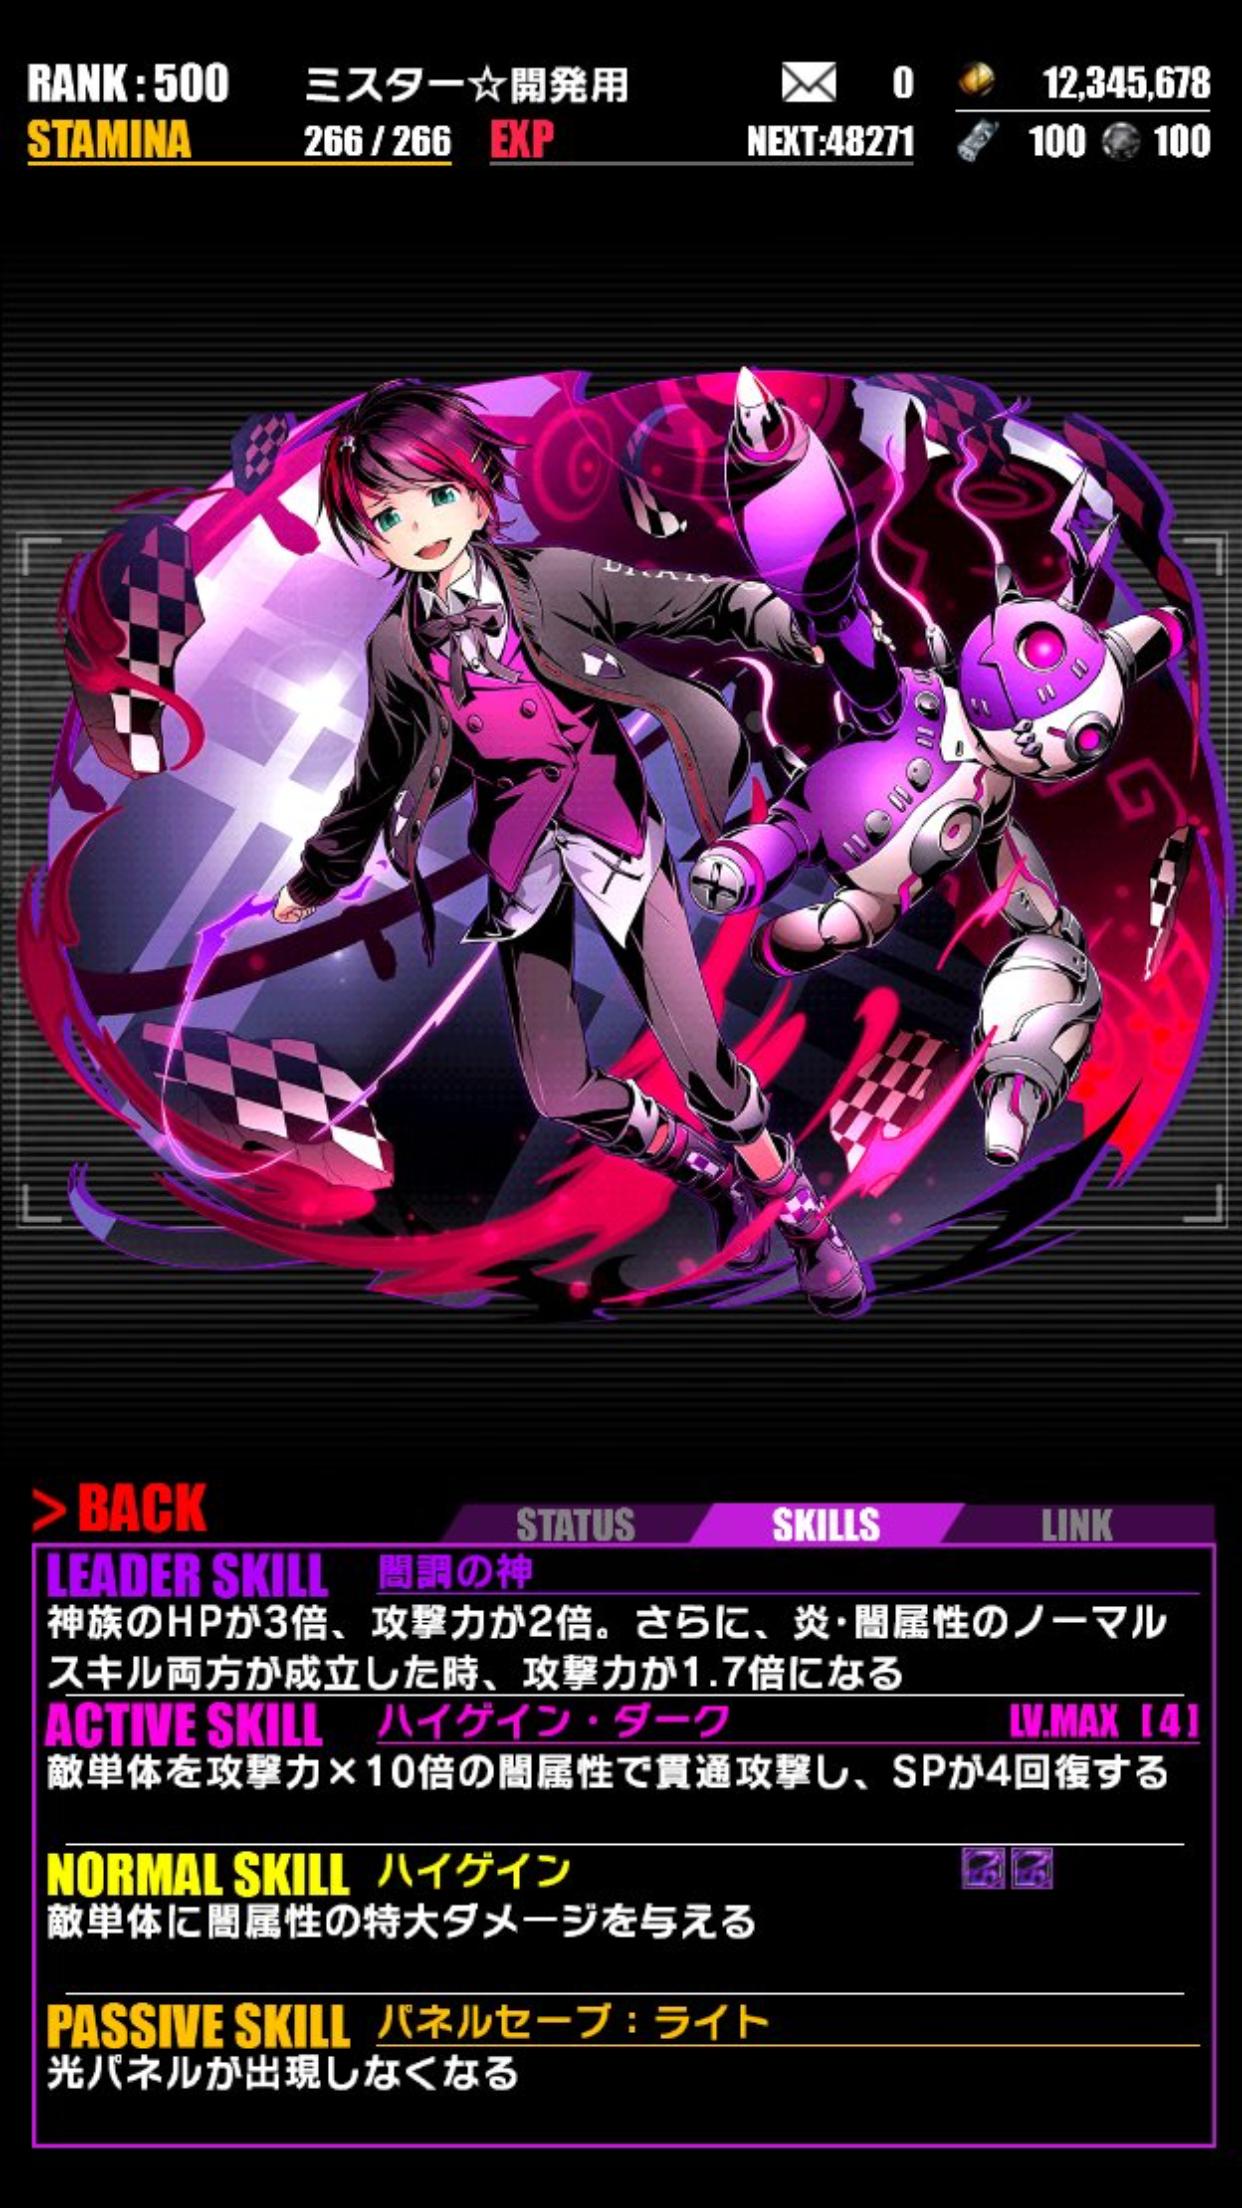 f:id:takumahakusyaku46:20170131021704p:image